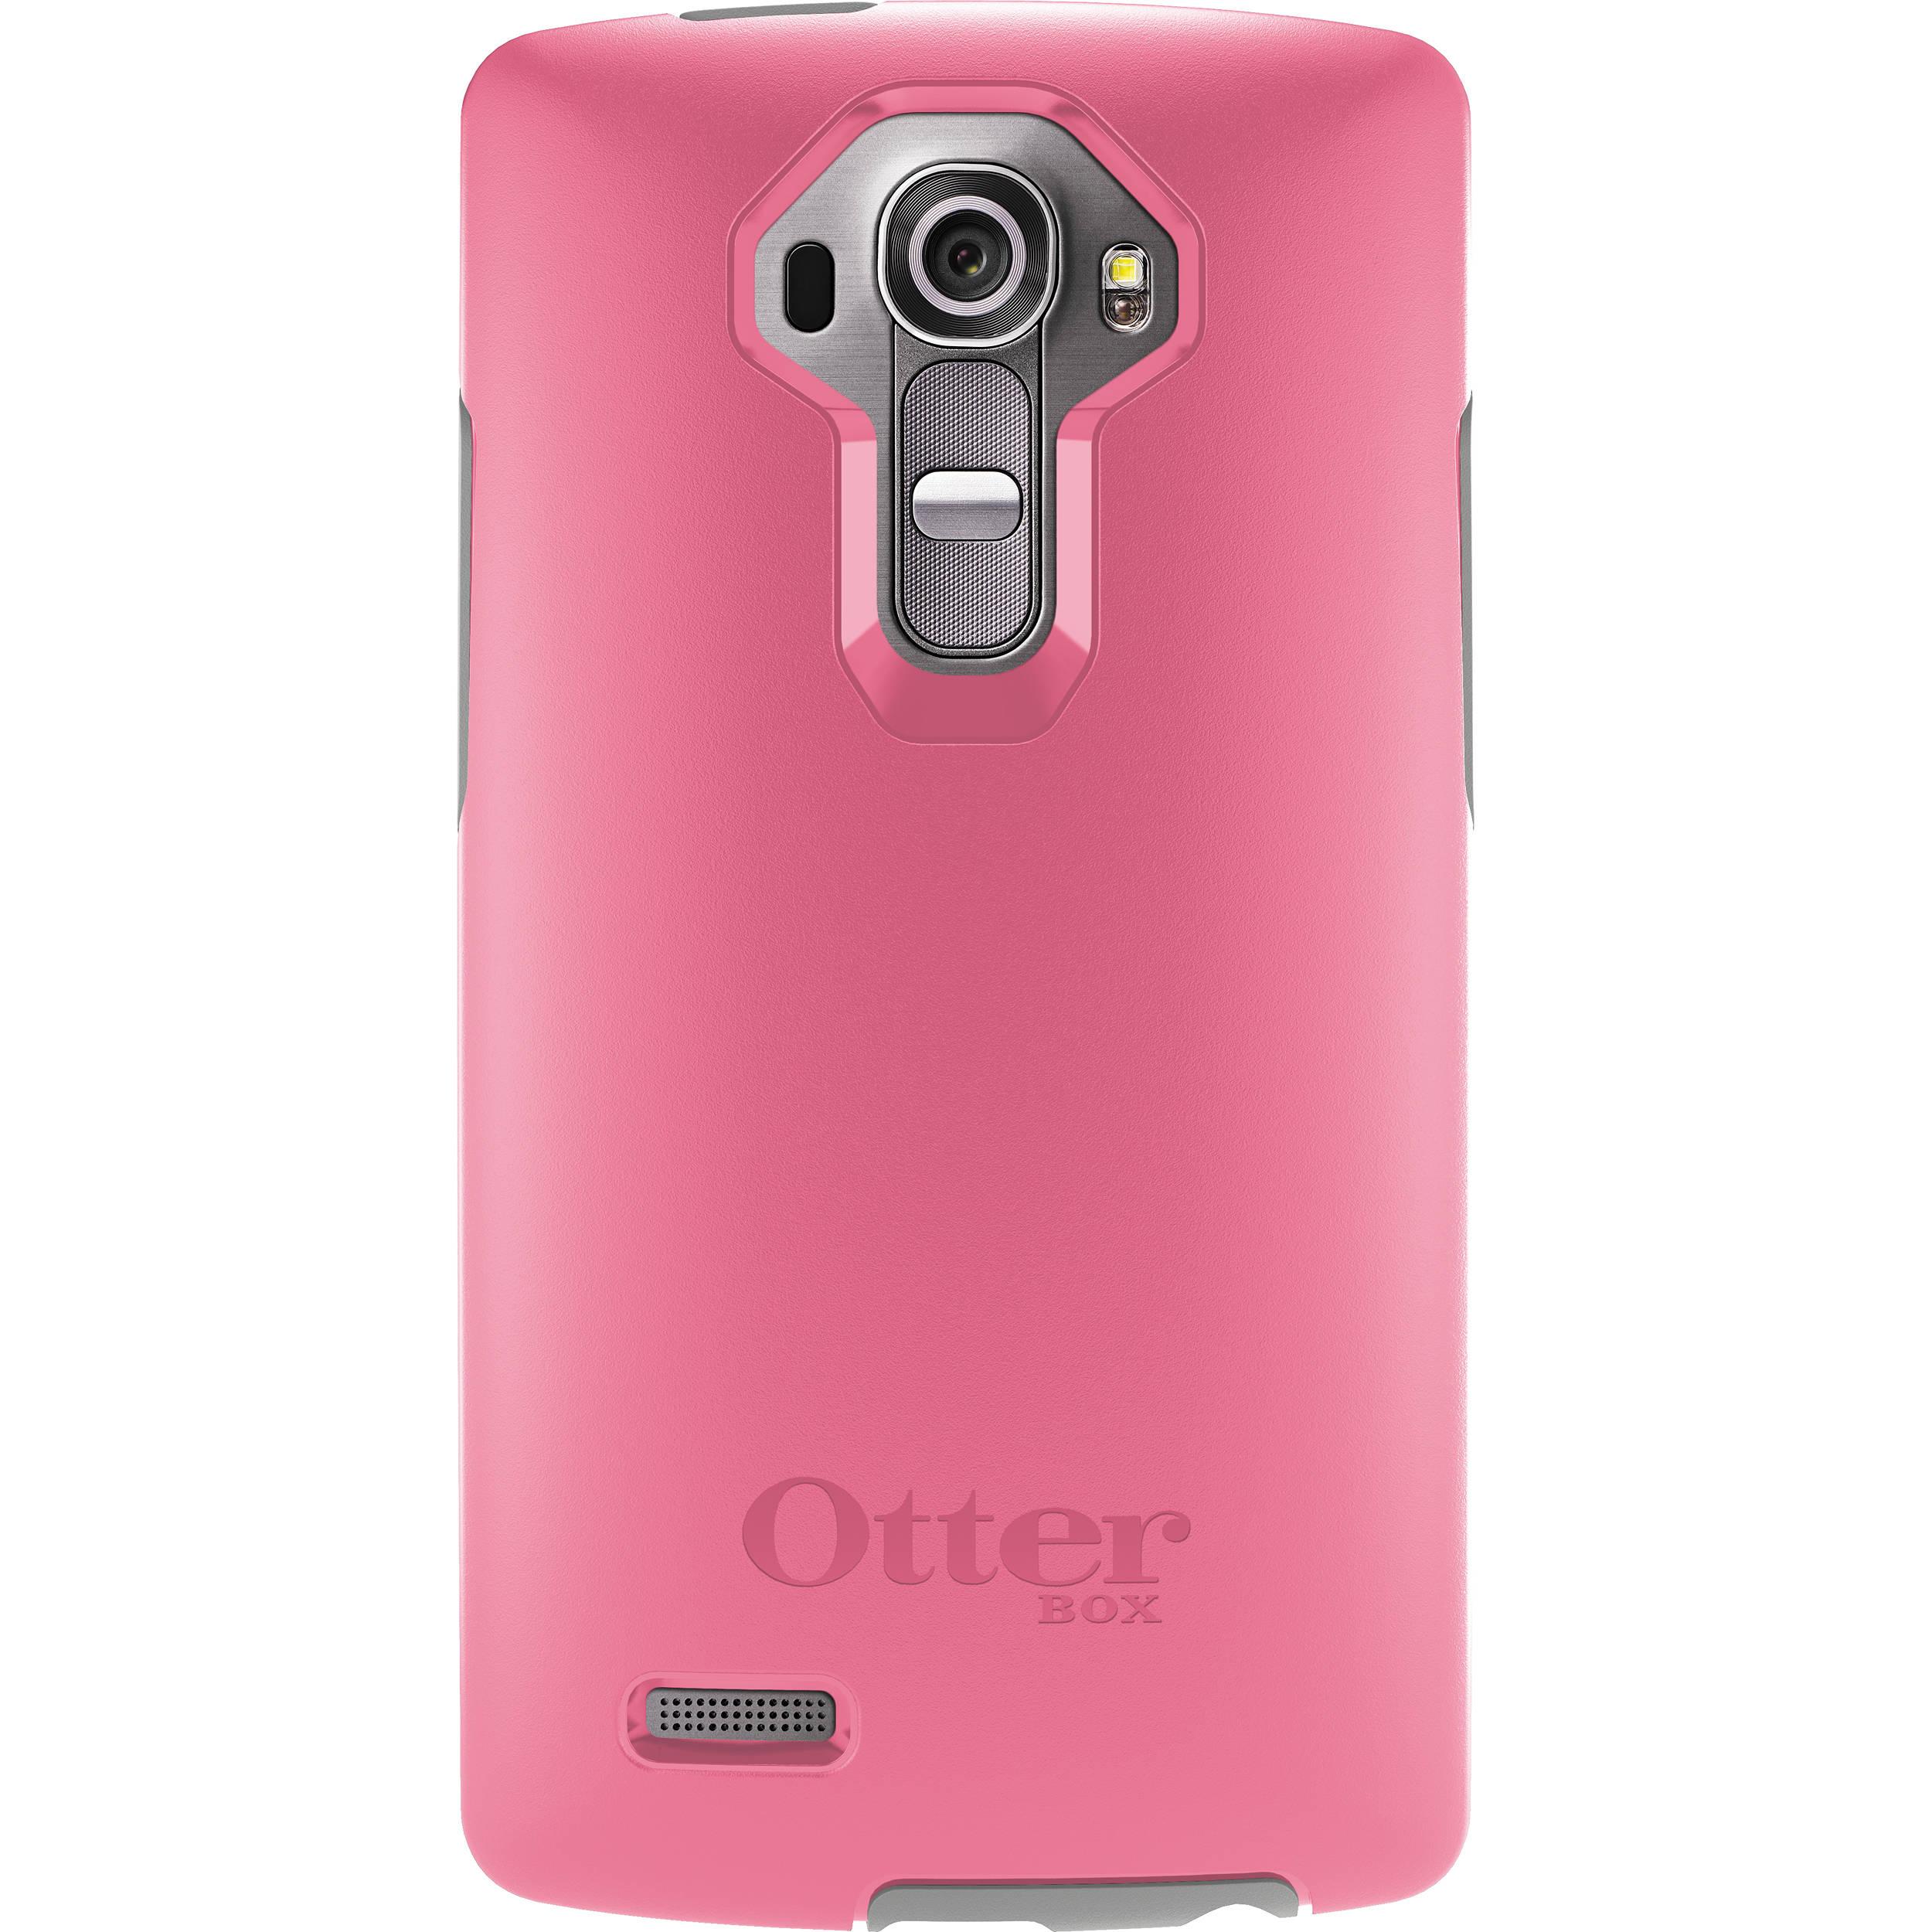 half off 301e5 1279e OtterBox Symmetry Series Case for LG G4 (Pink Pebble)